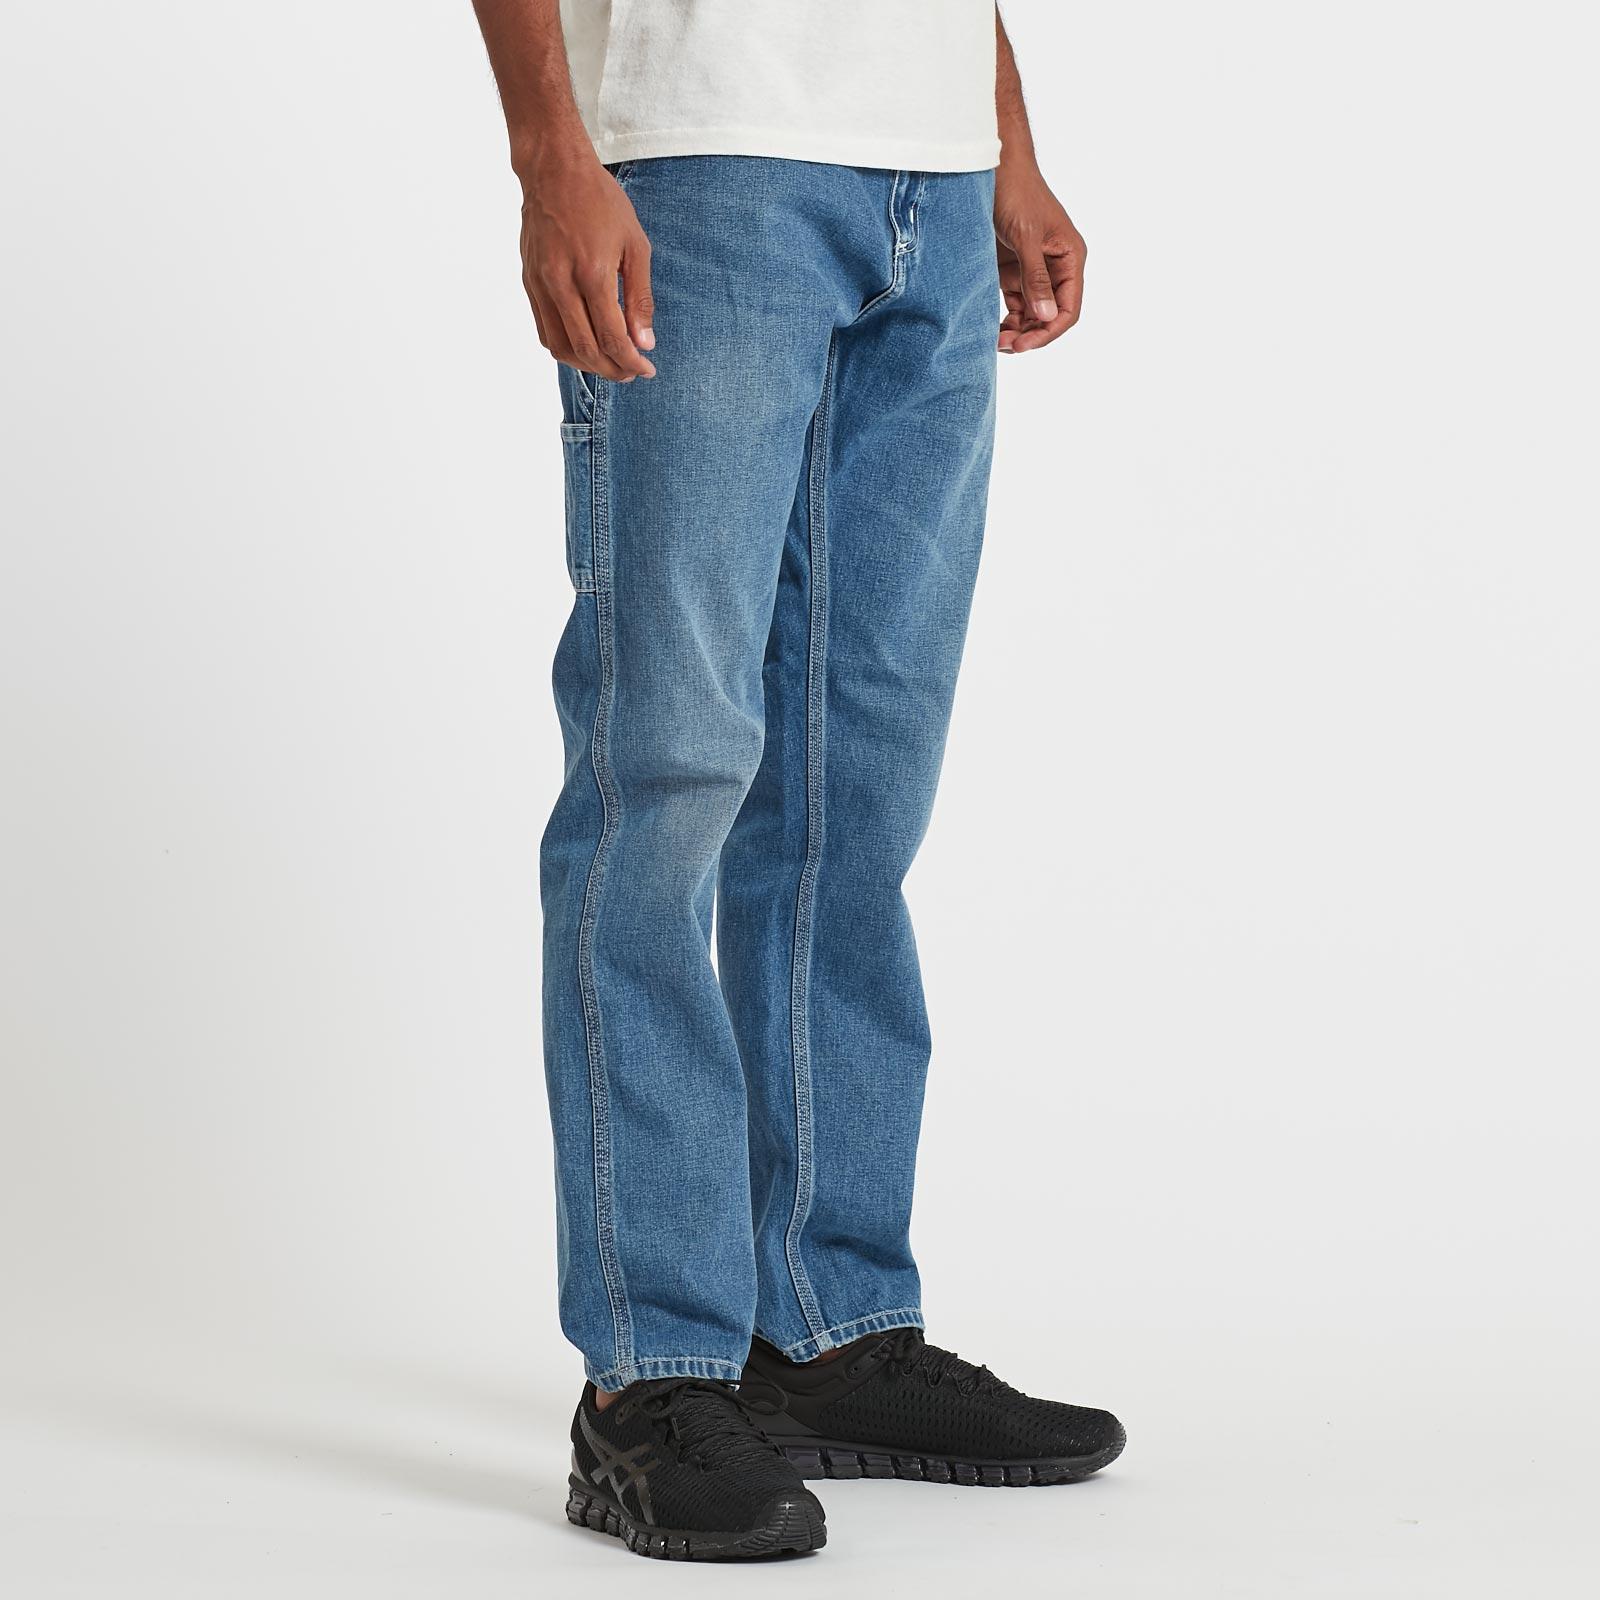 ff15dca9 Carhartt WIP Ruck Single Knee Pant - I022948.01.tc - Sneakersnstuff ...